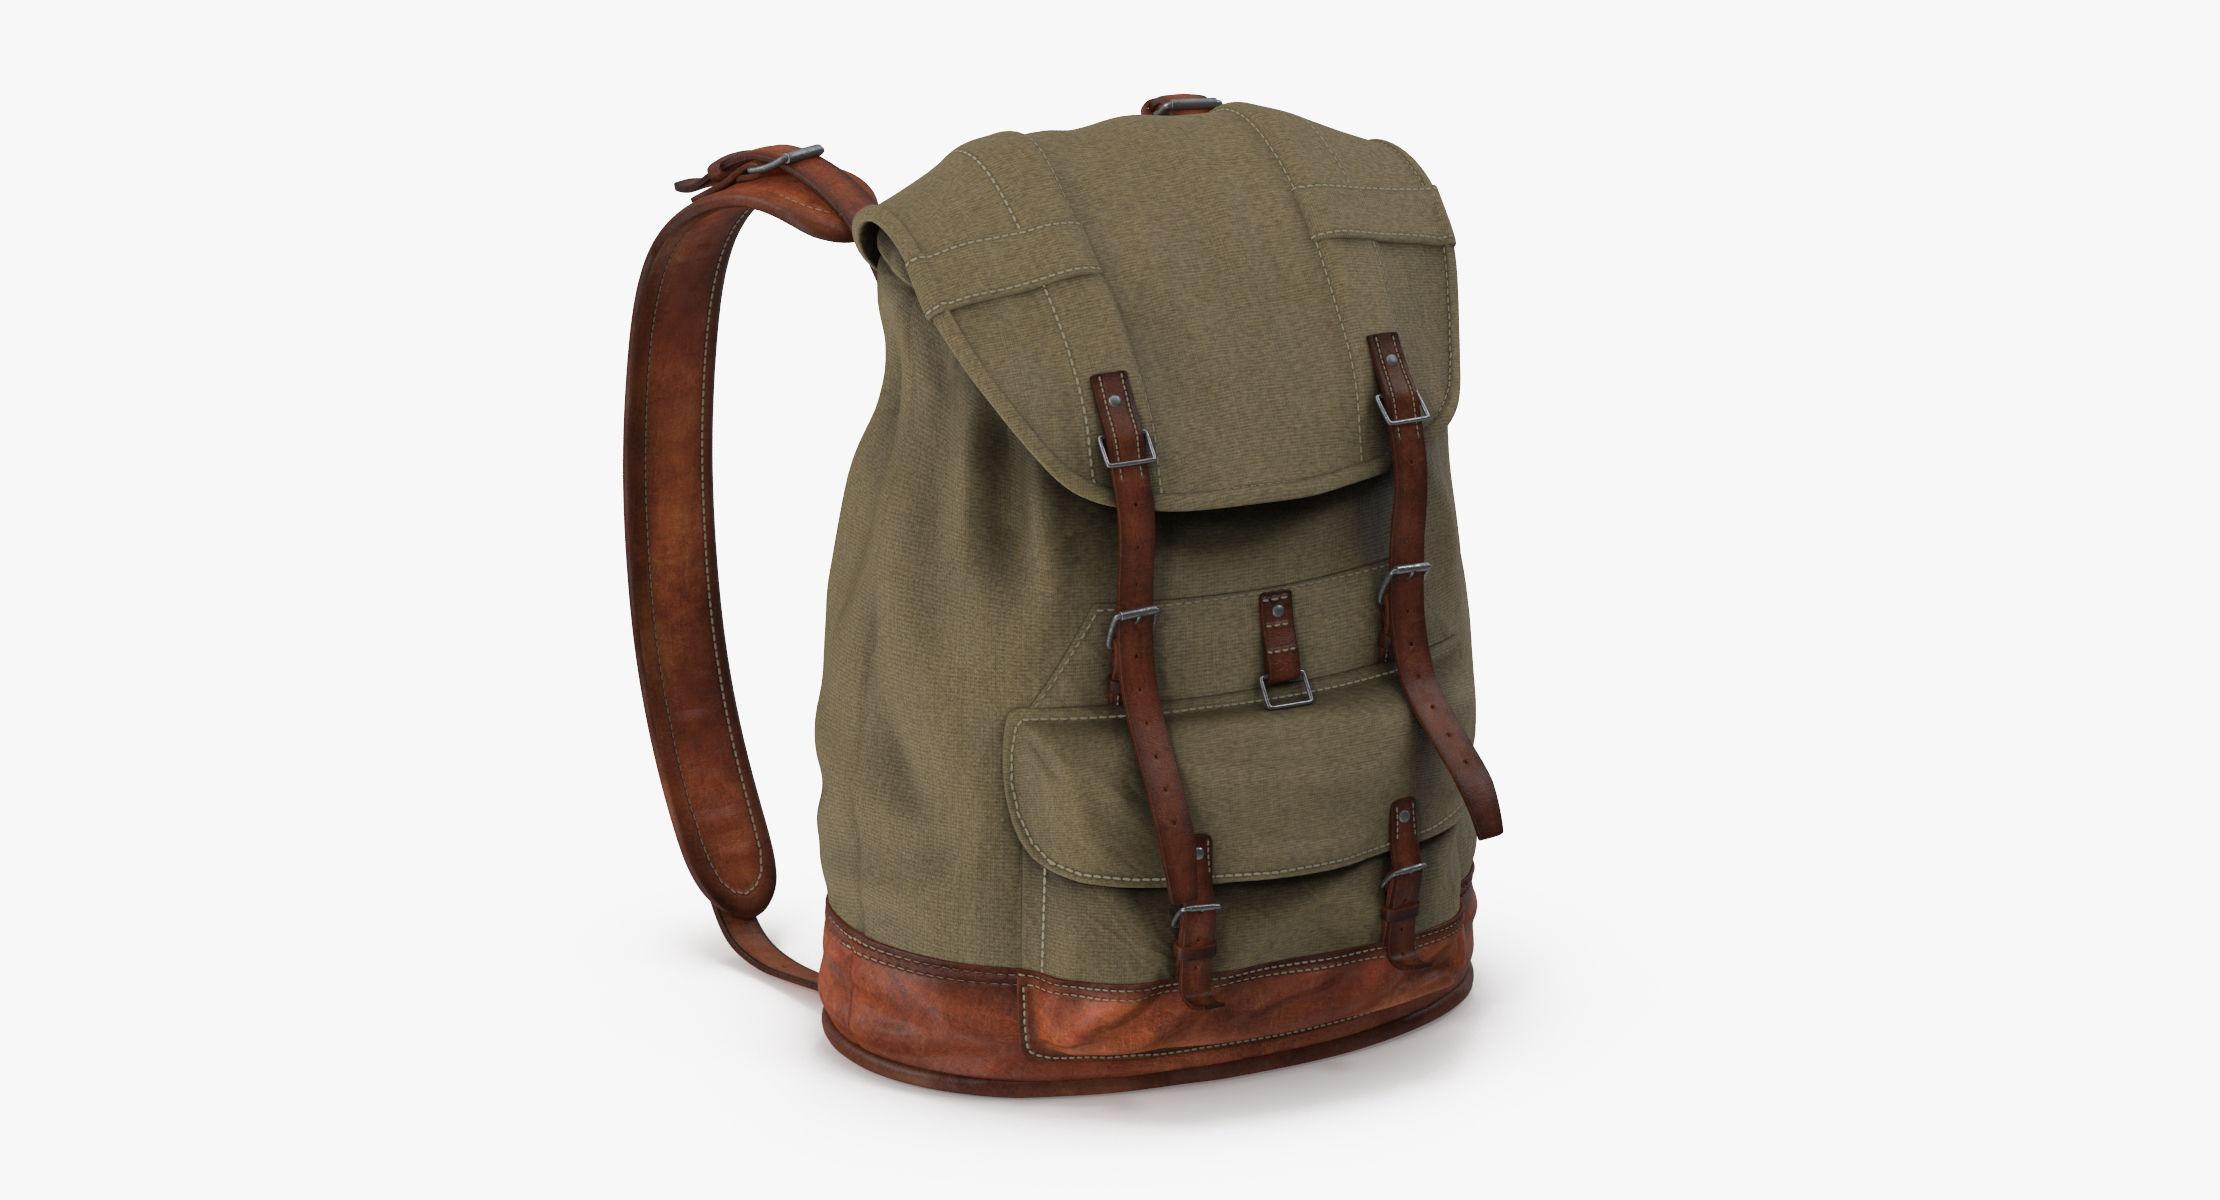 Travel Backpack Standing 01 - reel 1